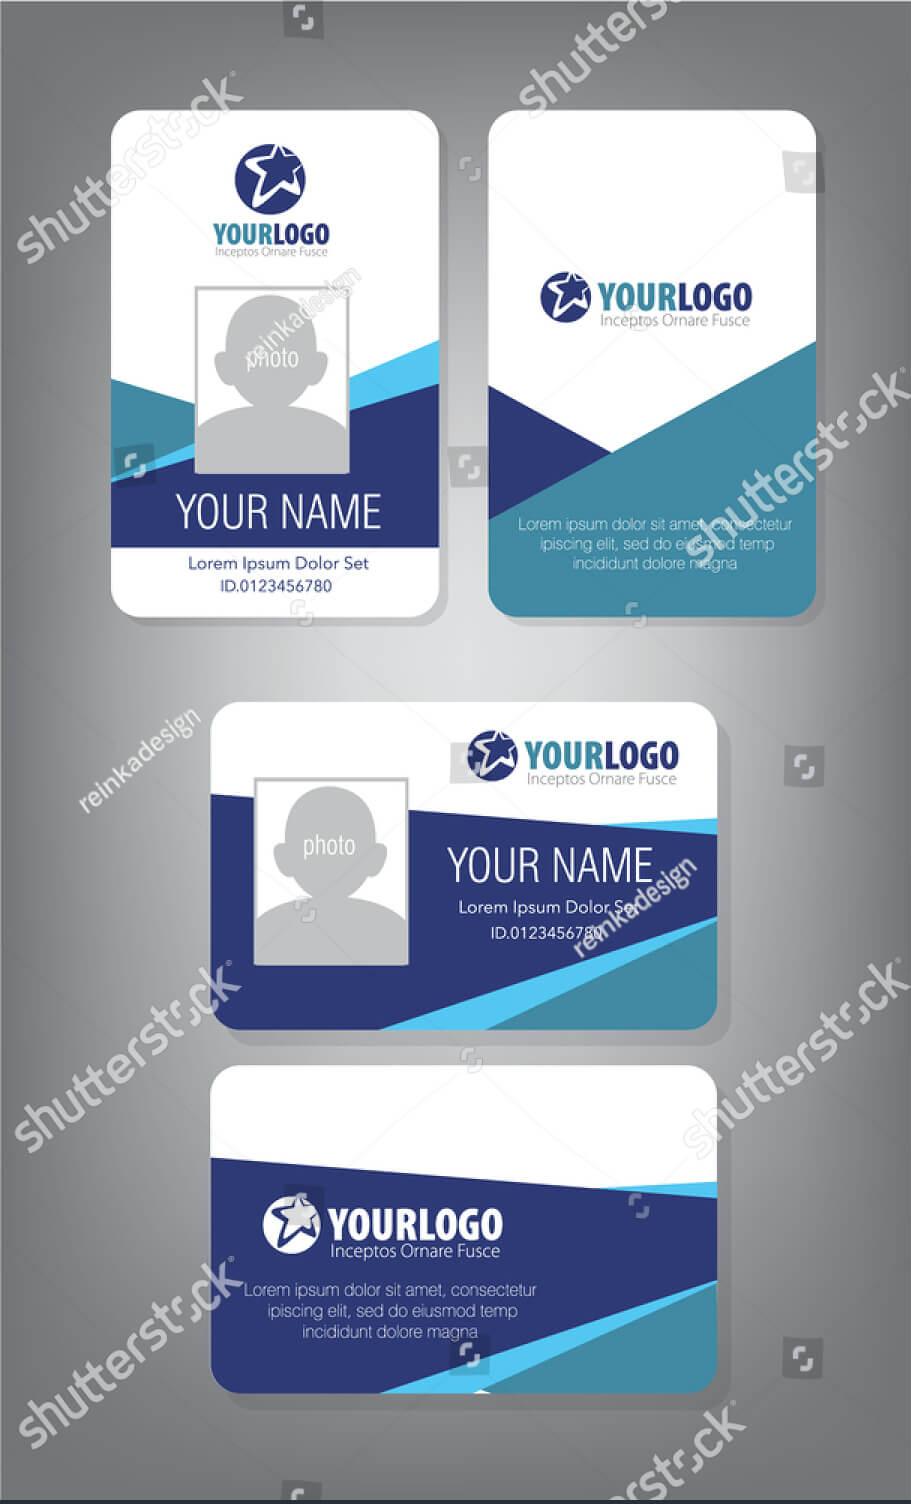 43+ Professional Id Card Designs - Psd, Eps, Ai, Word | Free regarding Employee Card Template Word